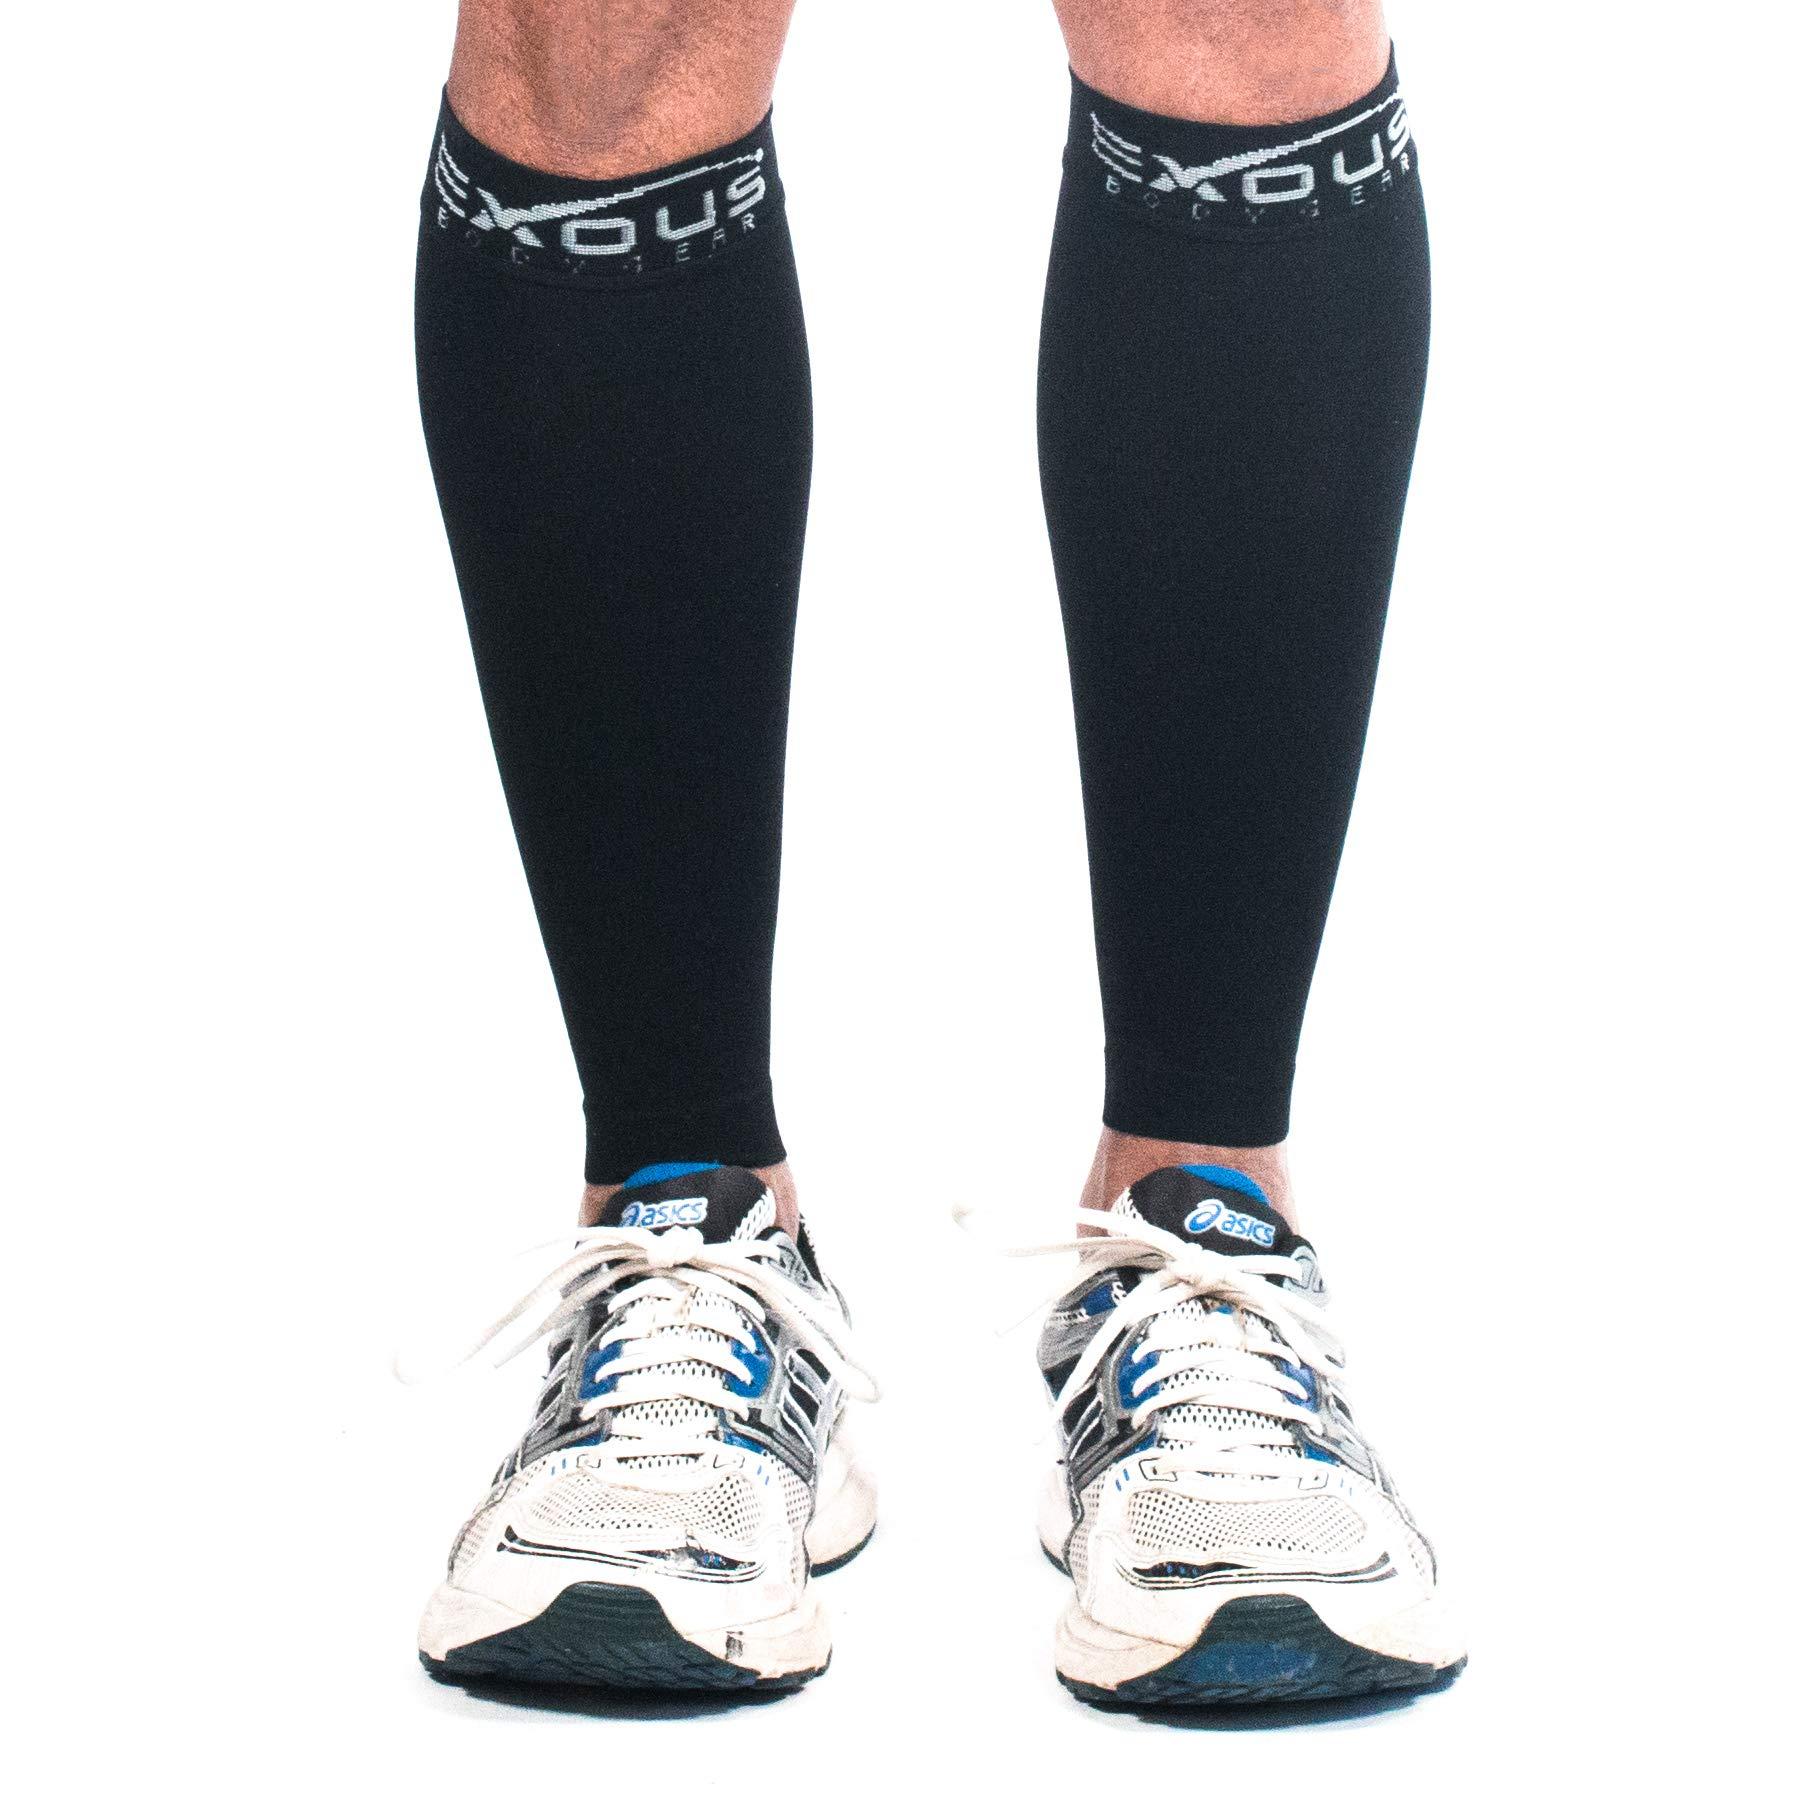 763ac6cf7e Amazon.com  Compression Socks - Calf Compression Sleeve Running ...